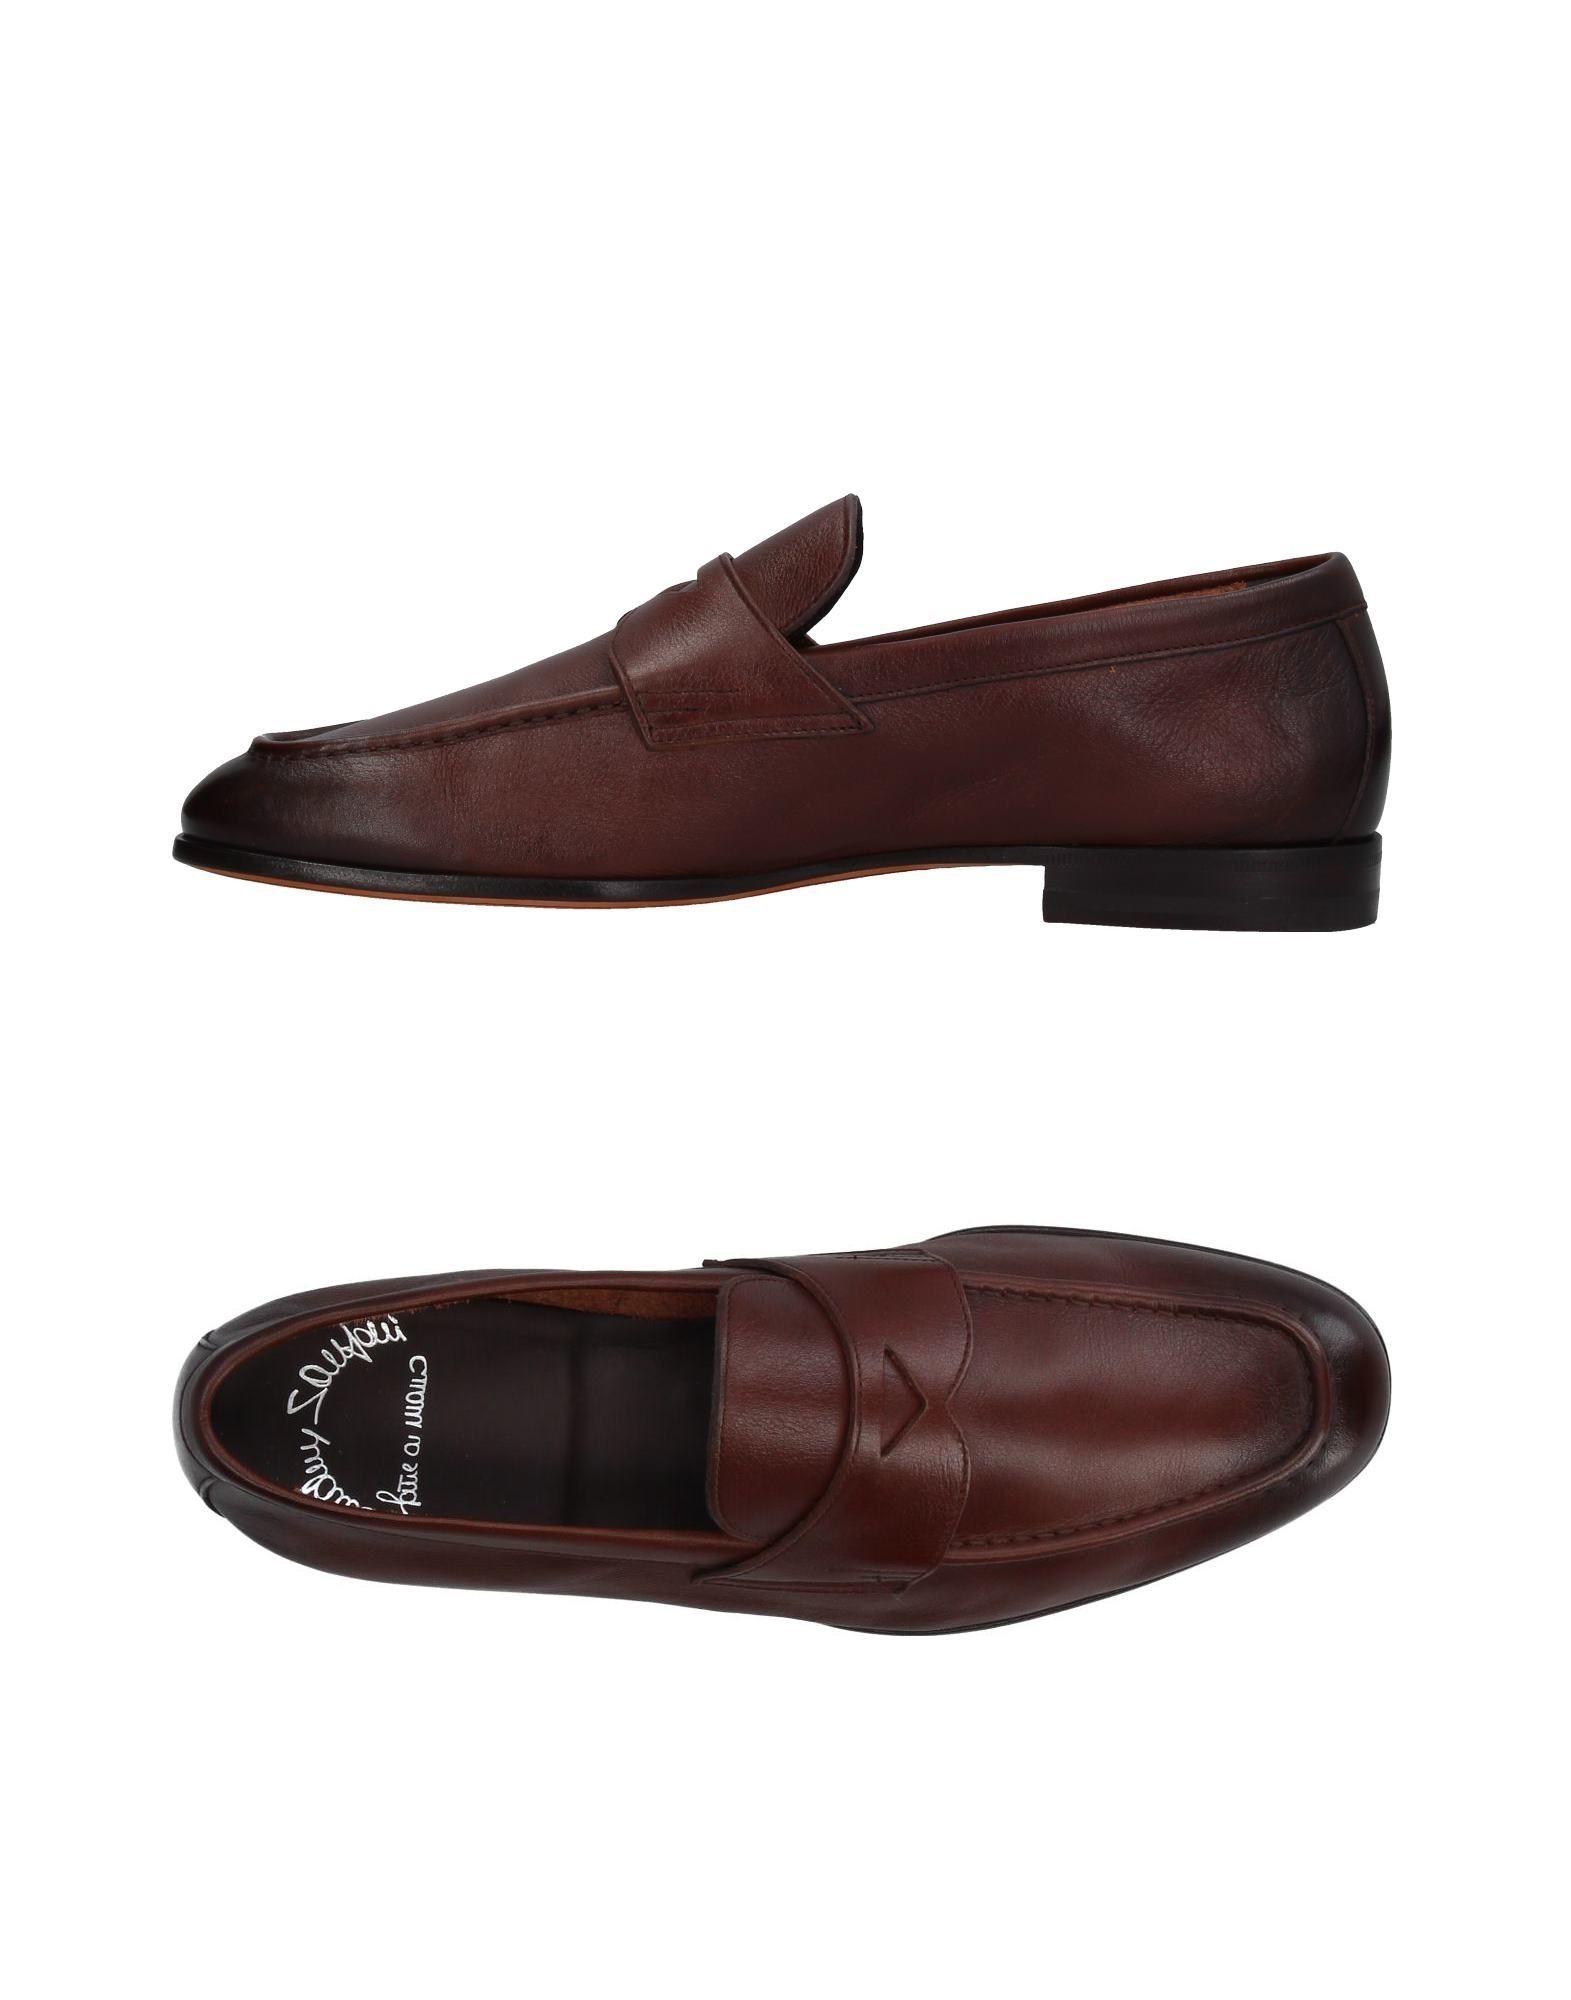 Santoni Mokassins Herren  11409537IB Gute Qualität beliebte Schuhe